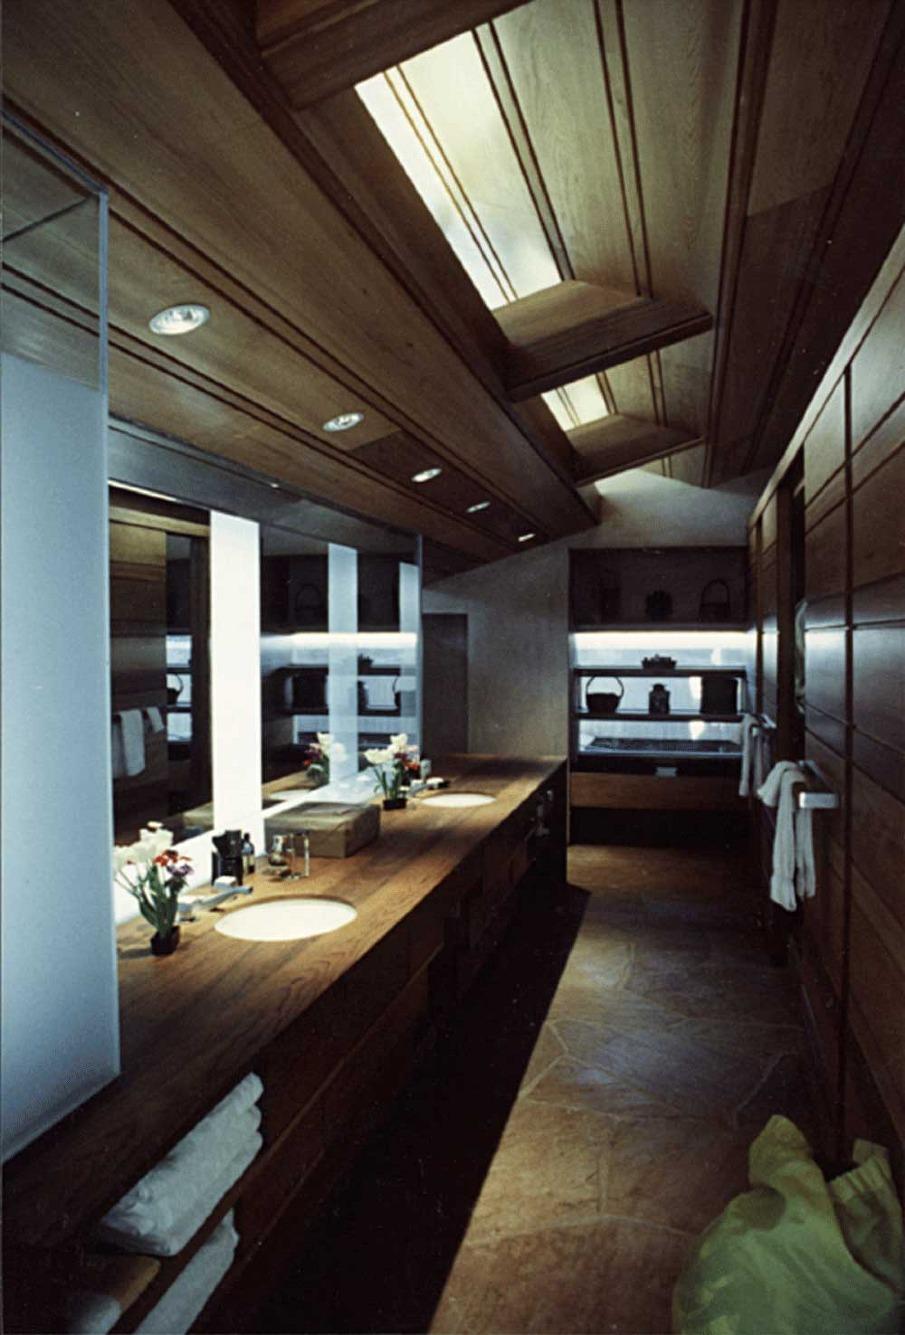 LUNN HOUSE I  The Architecture of Daniel Evan White